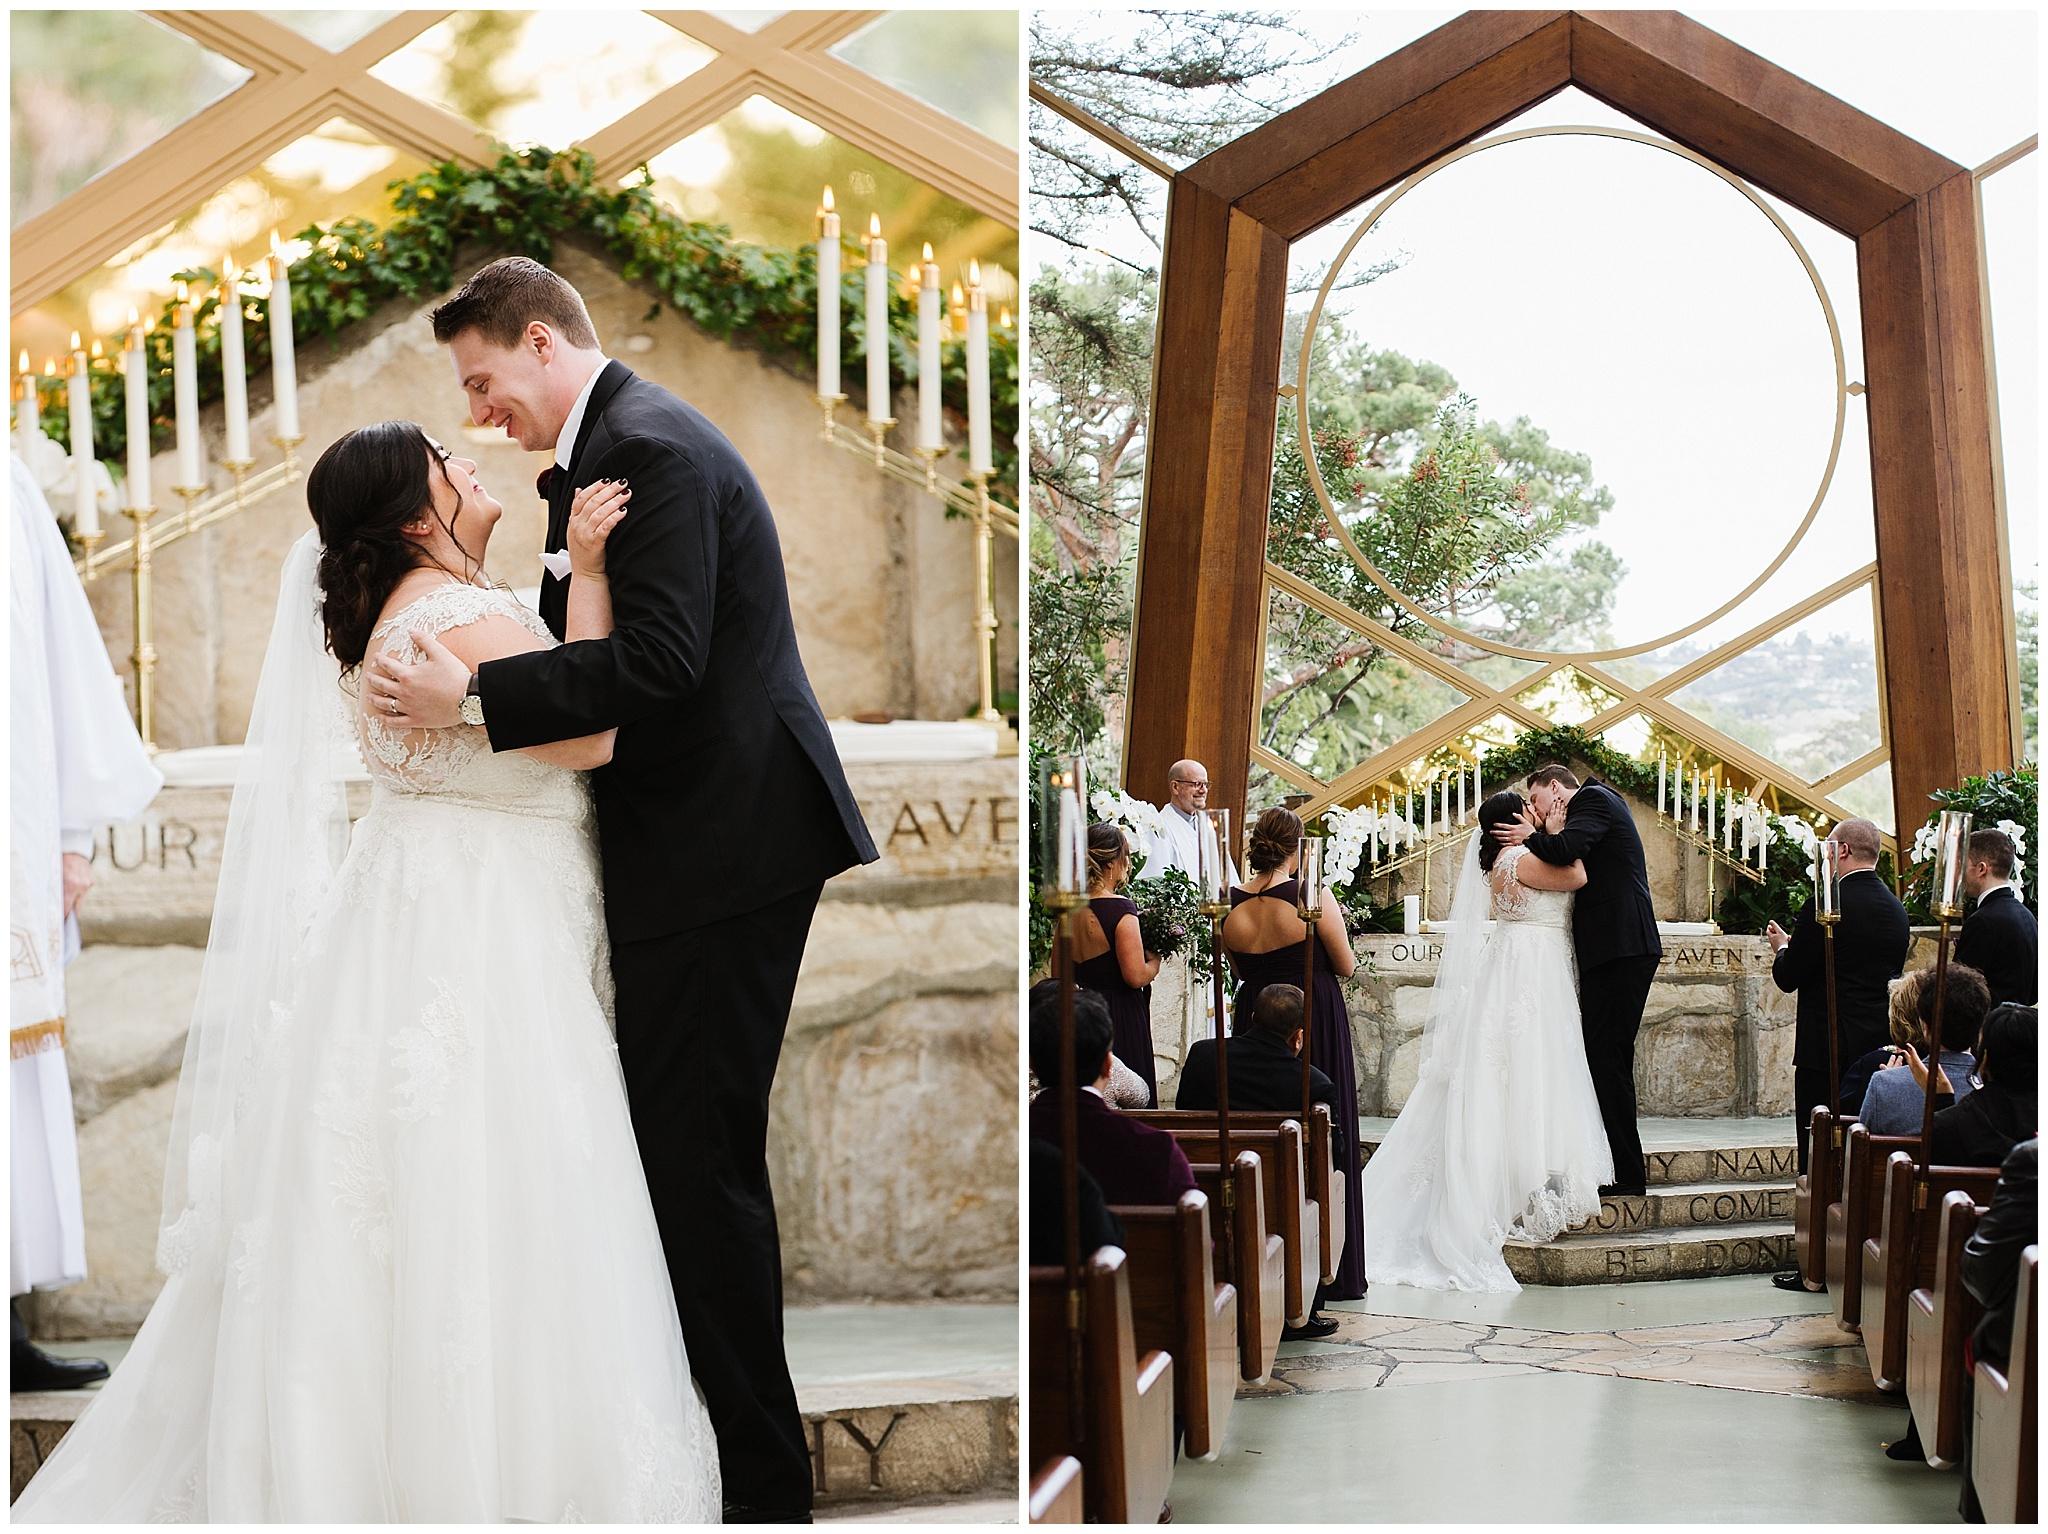 Carol_and_Grant_Wedding_3-3-18-8261.jpg